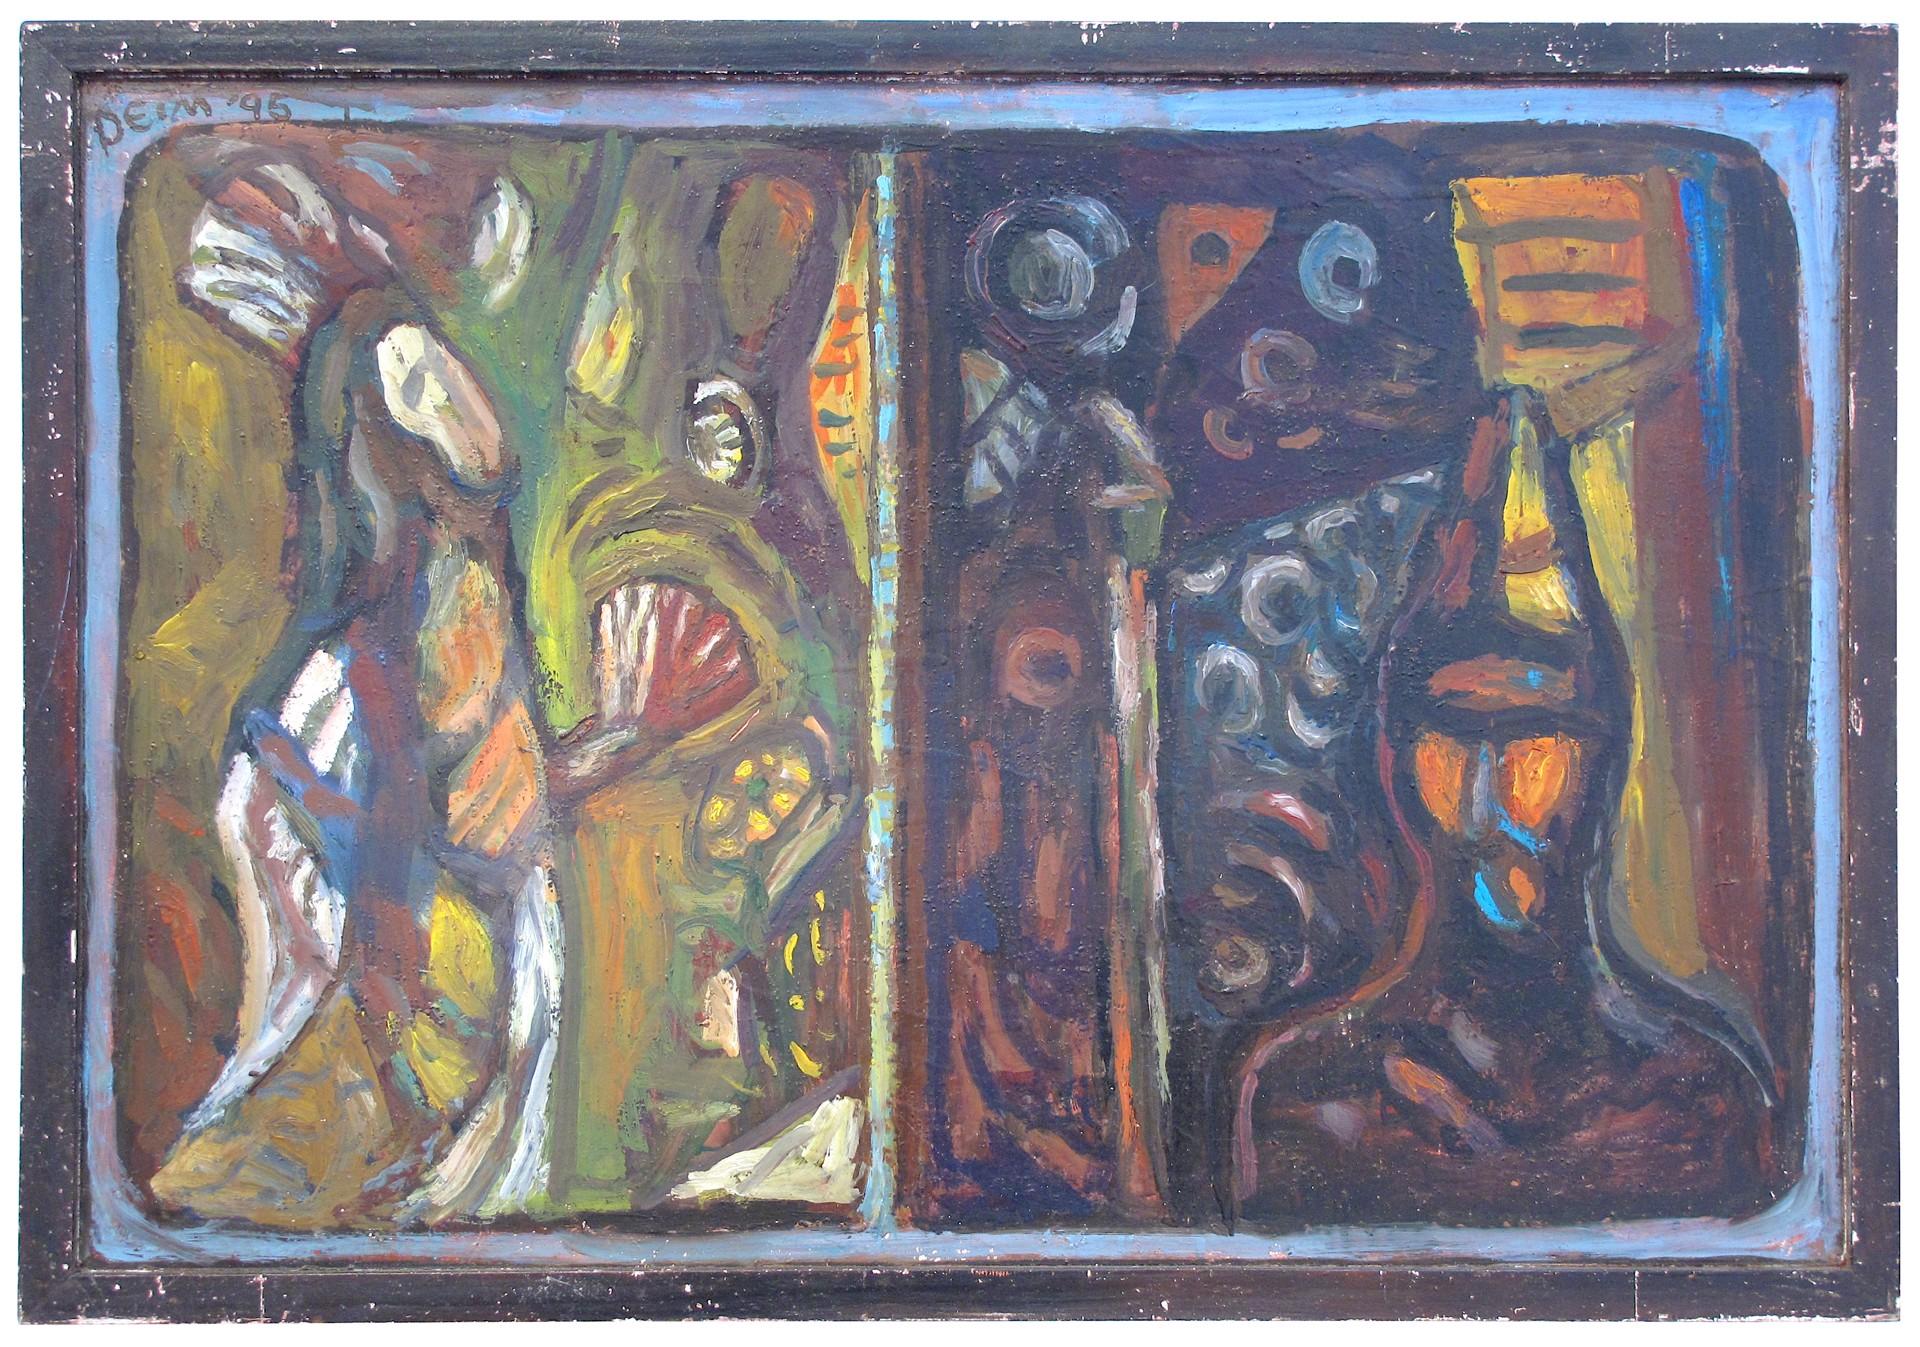 The Midnite Clown by Judith Deim